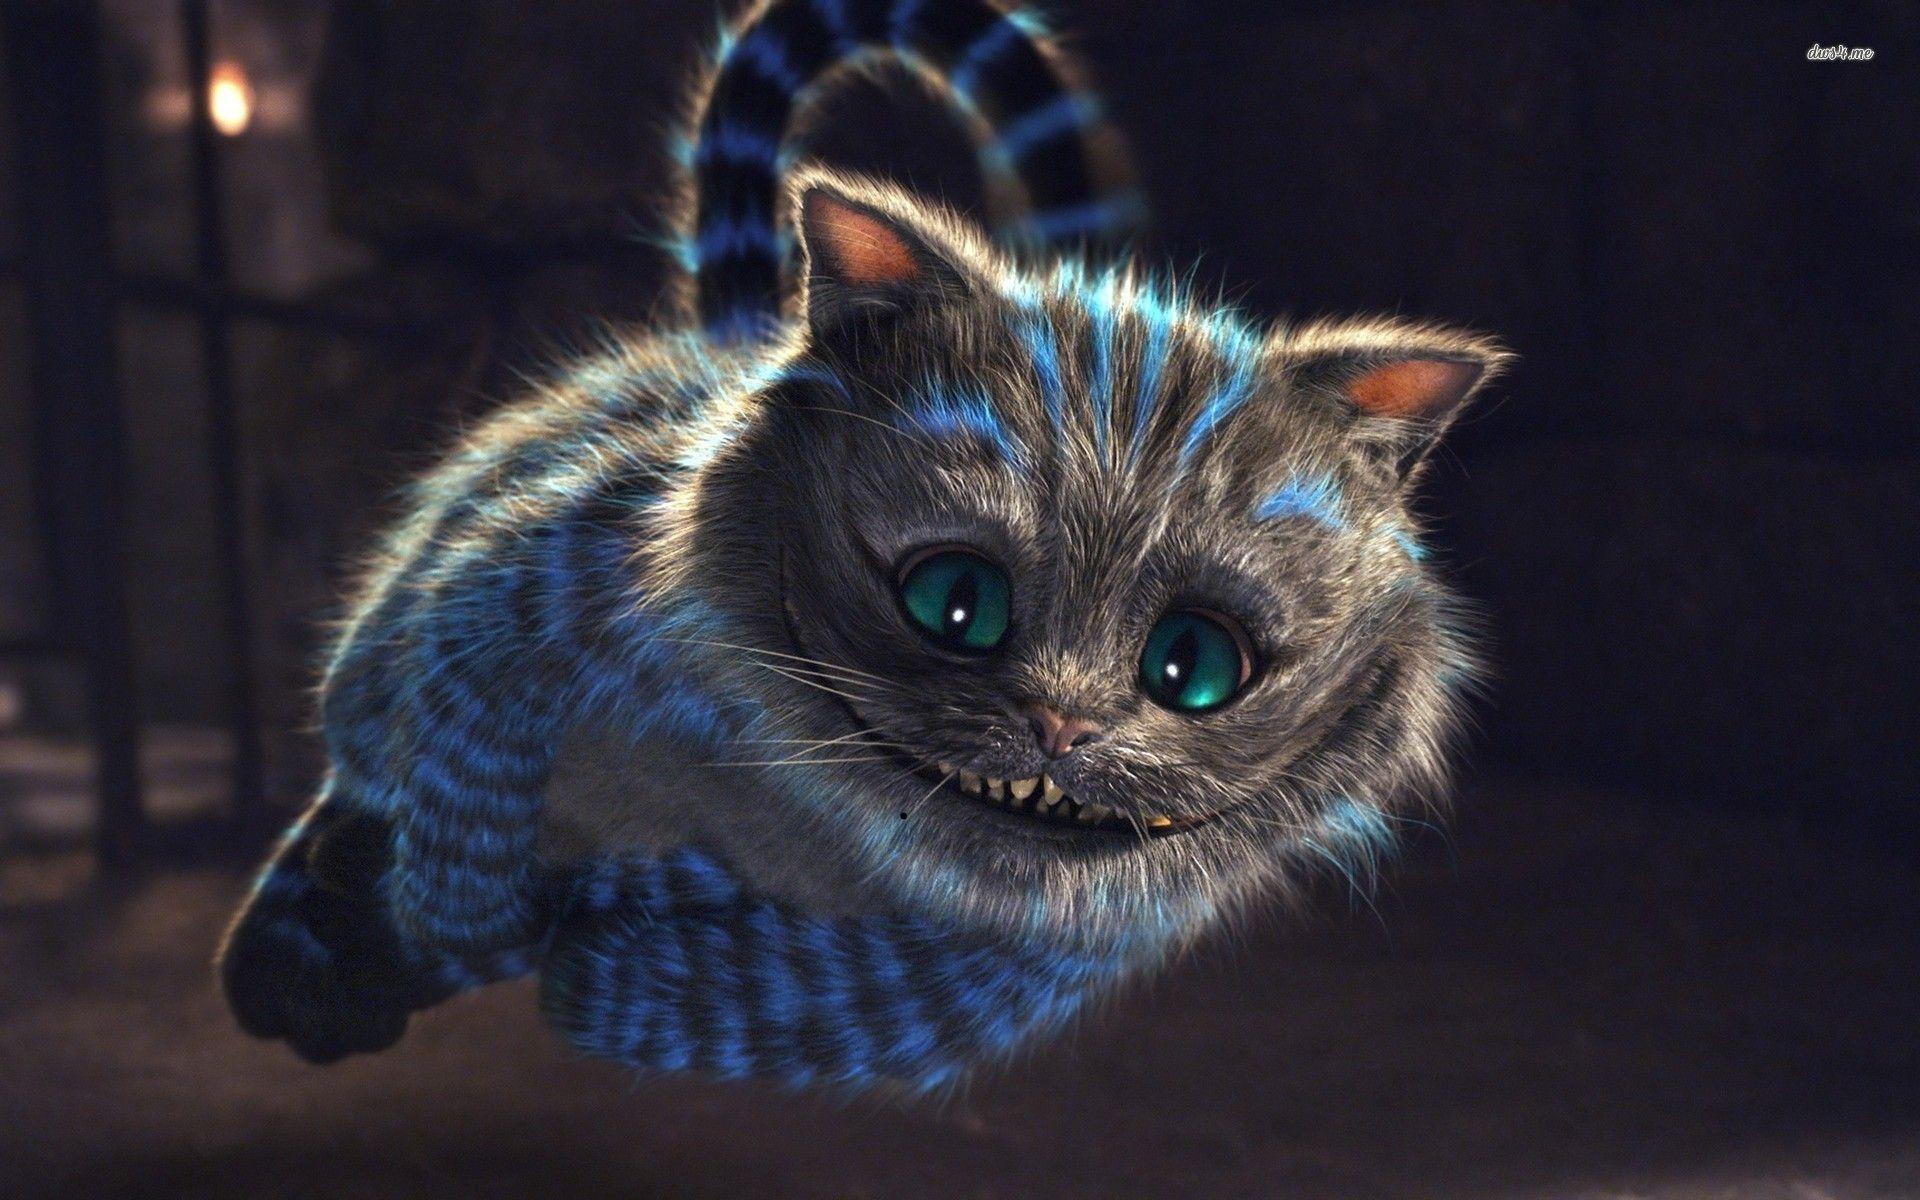 Cheshire Cat Wallpaper Cheshire Cat HD Wallpapers 1920x1200